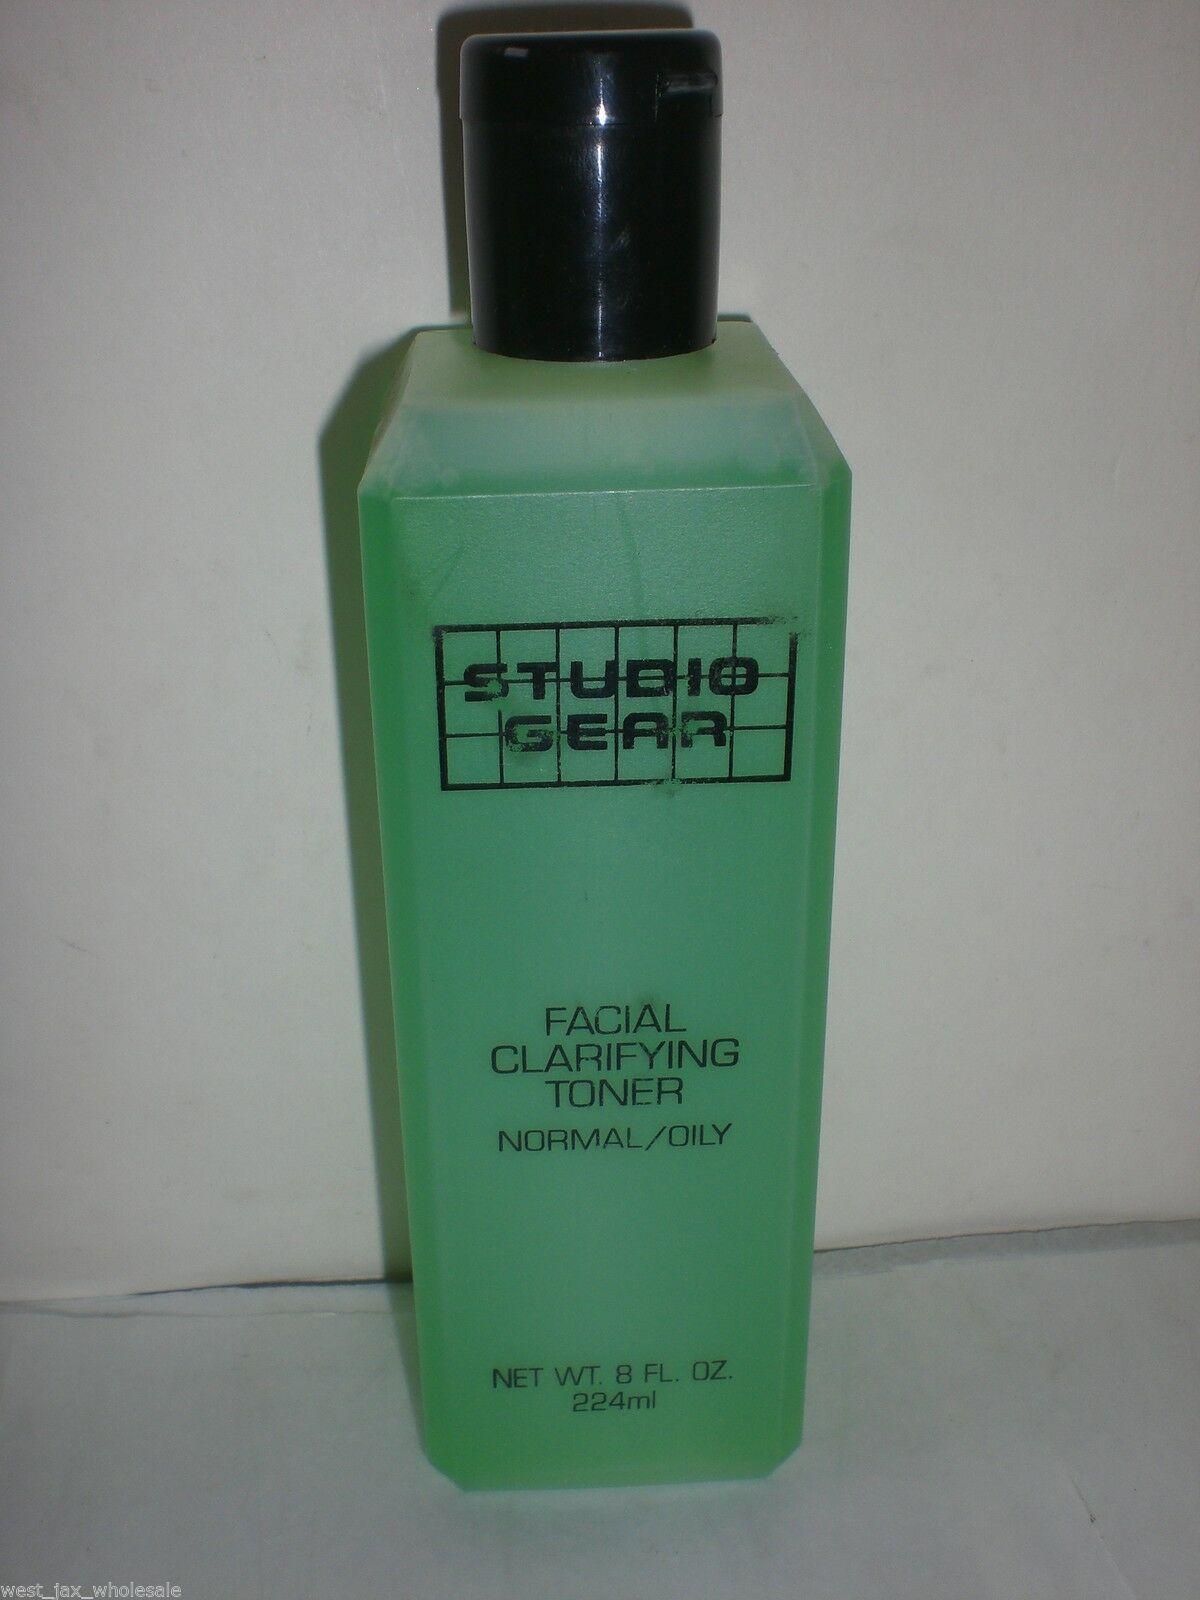 Studio Gear Facial Clarifying Toner Normal Oily Skin Pore Cleanser 8 Oz Lot of 2 image 2